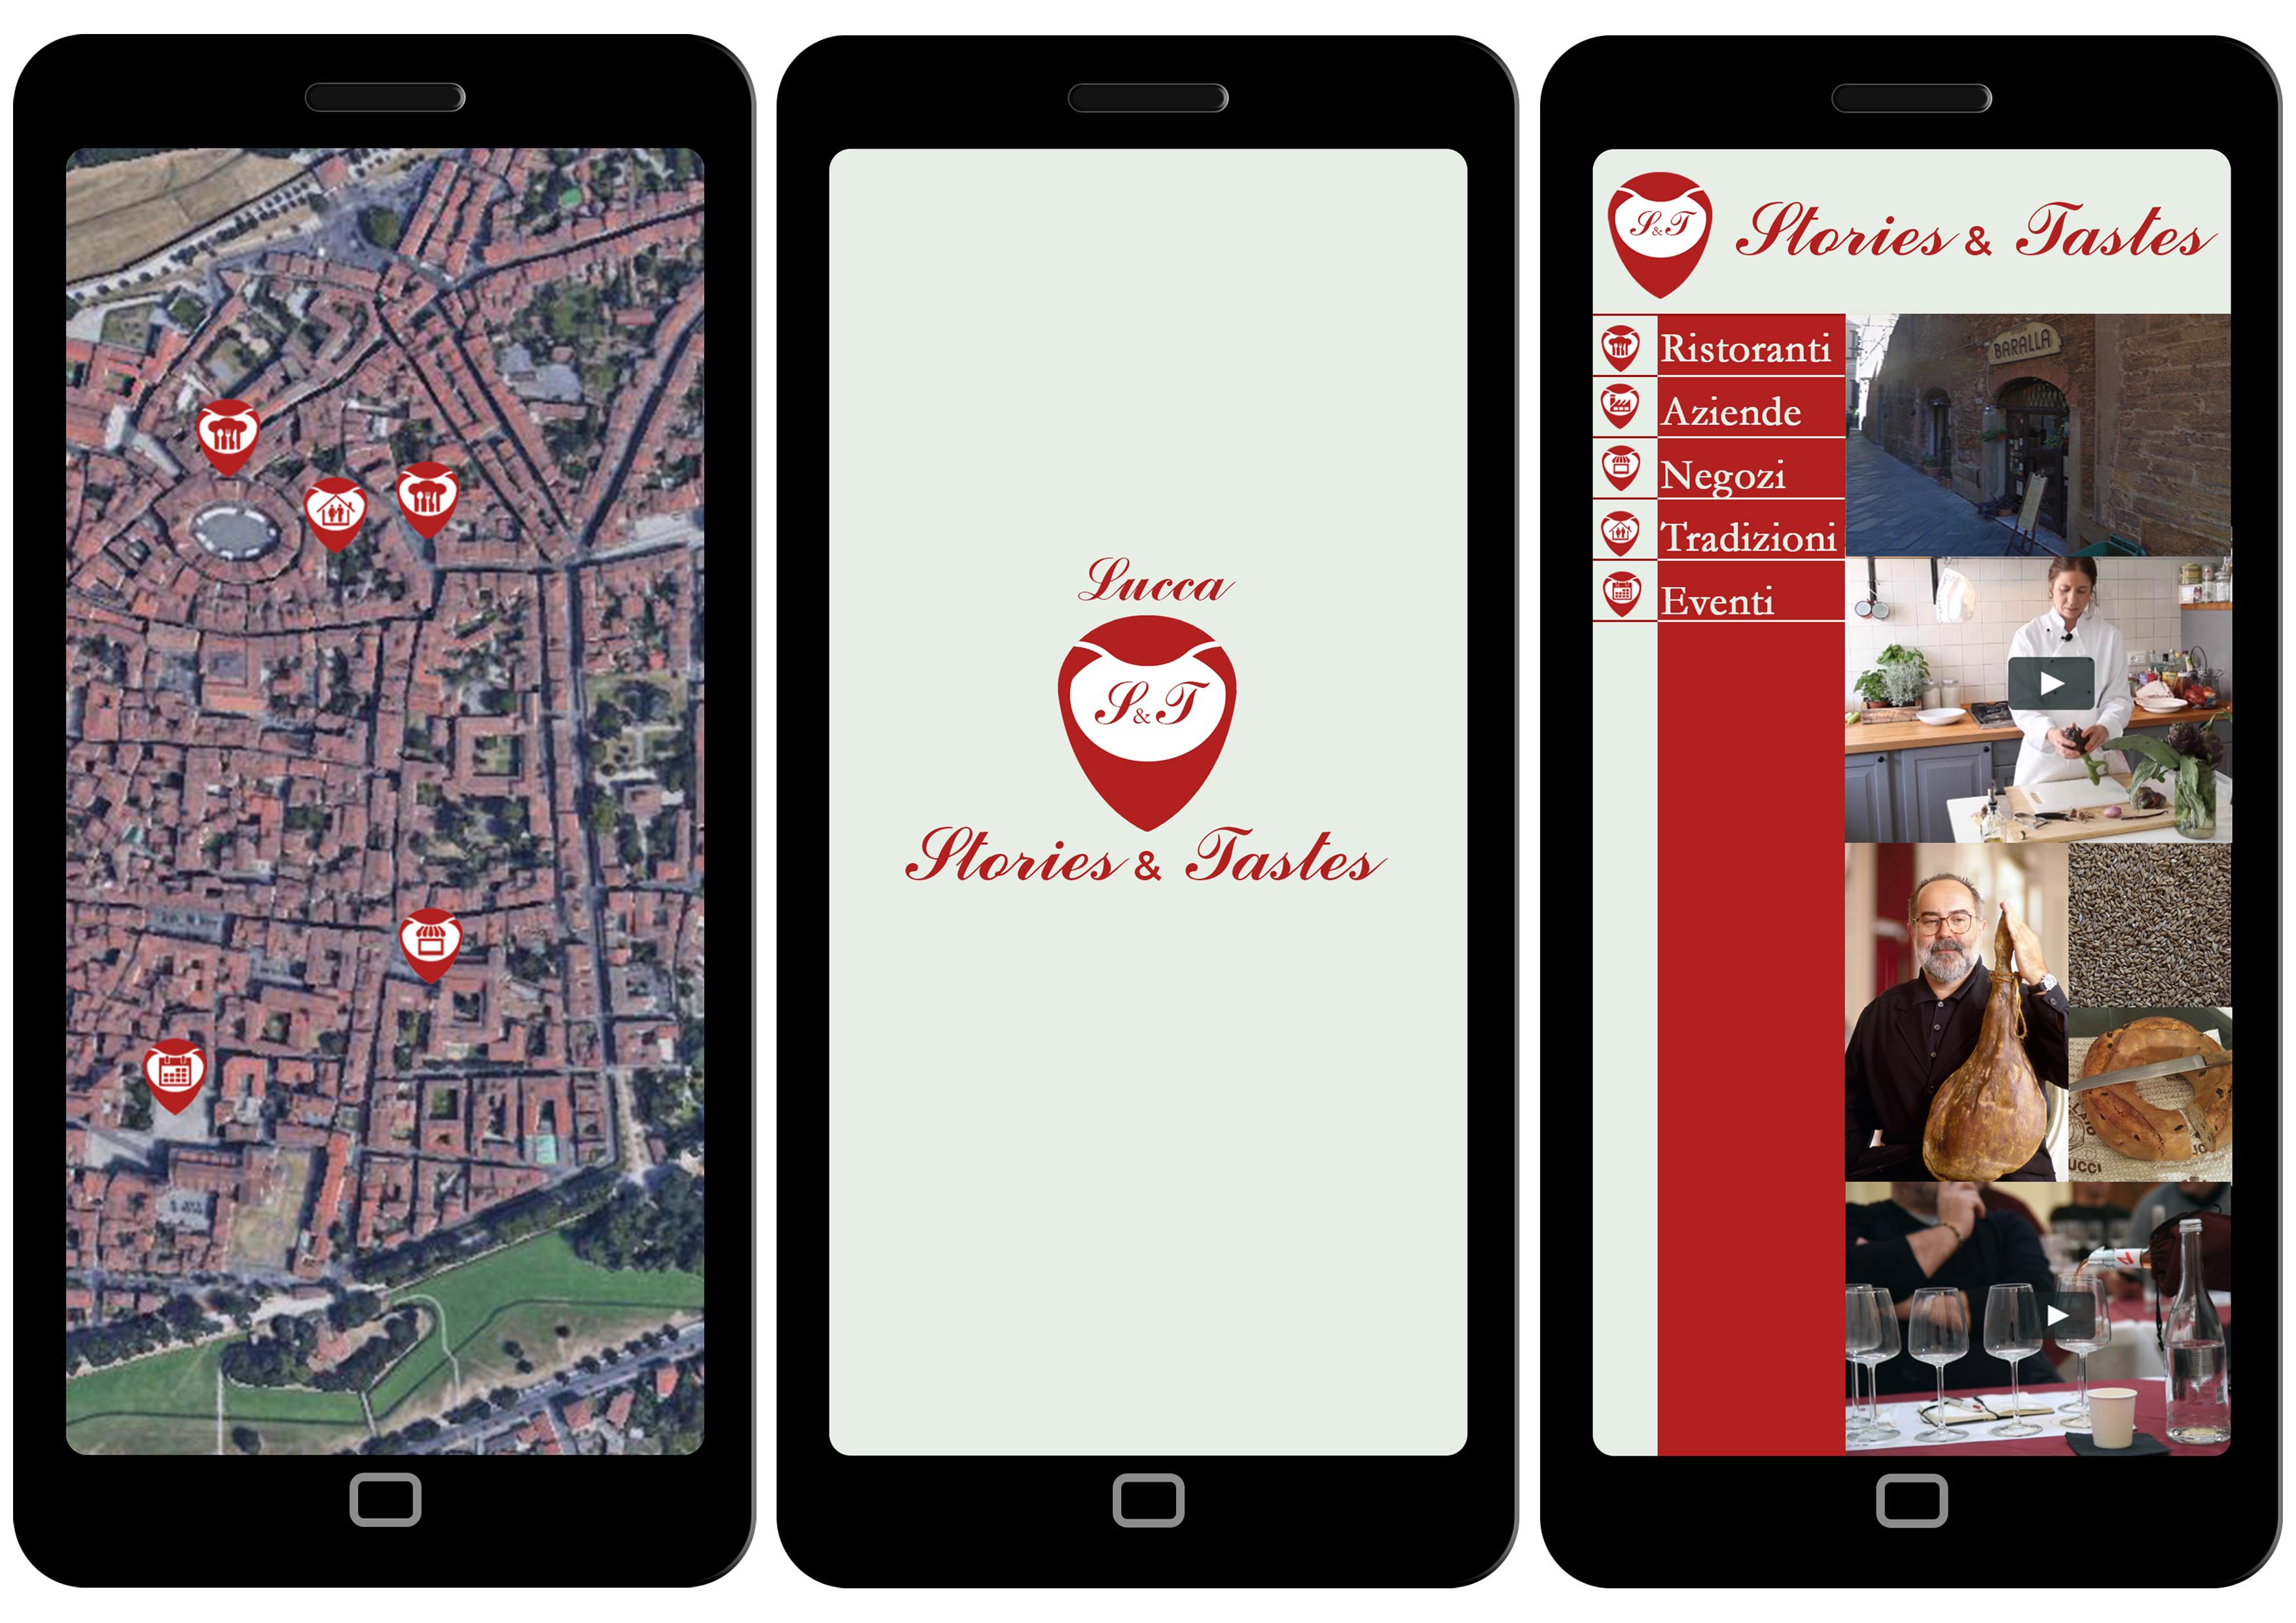 Locandina Lucca: stories&tastes. Web app